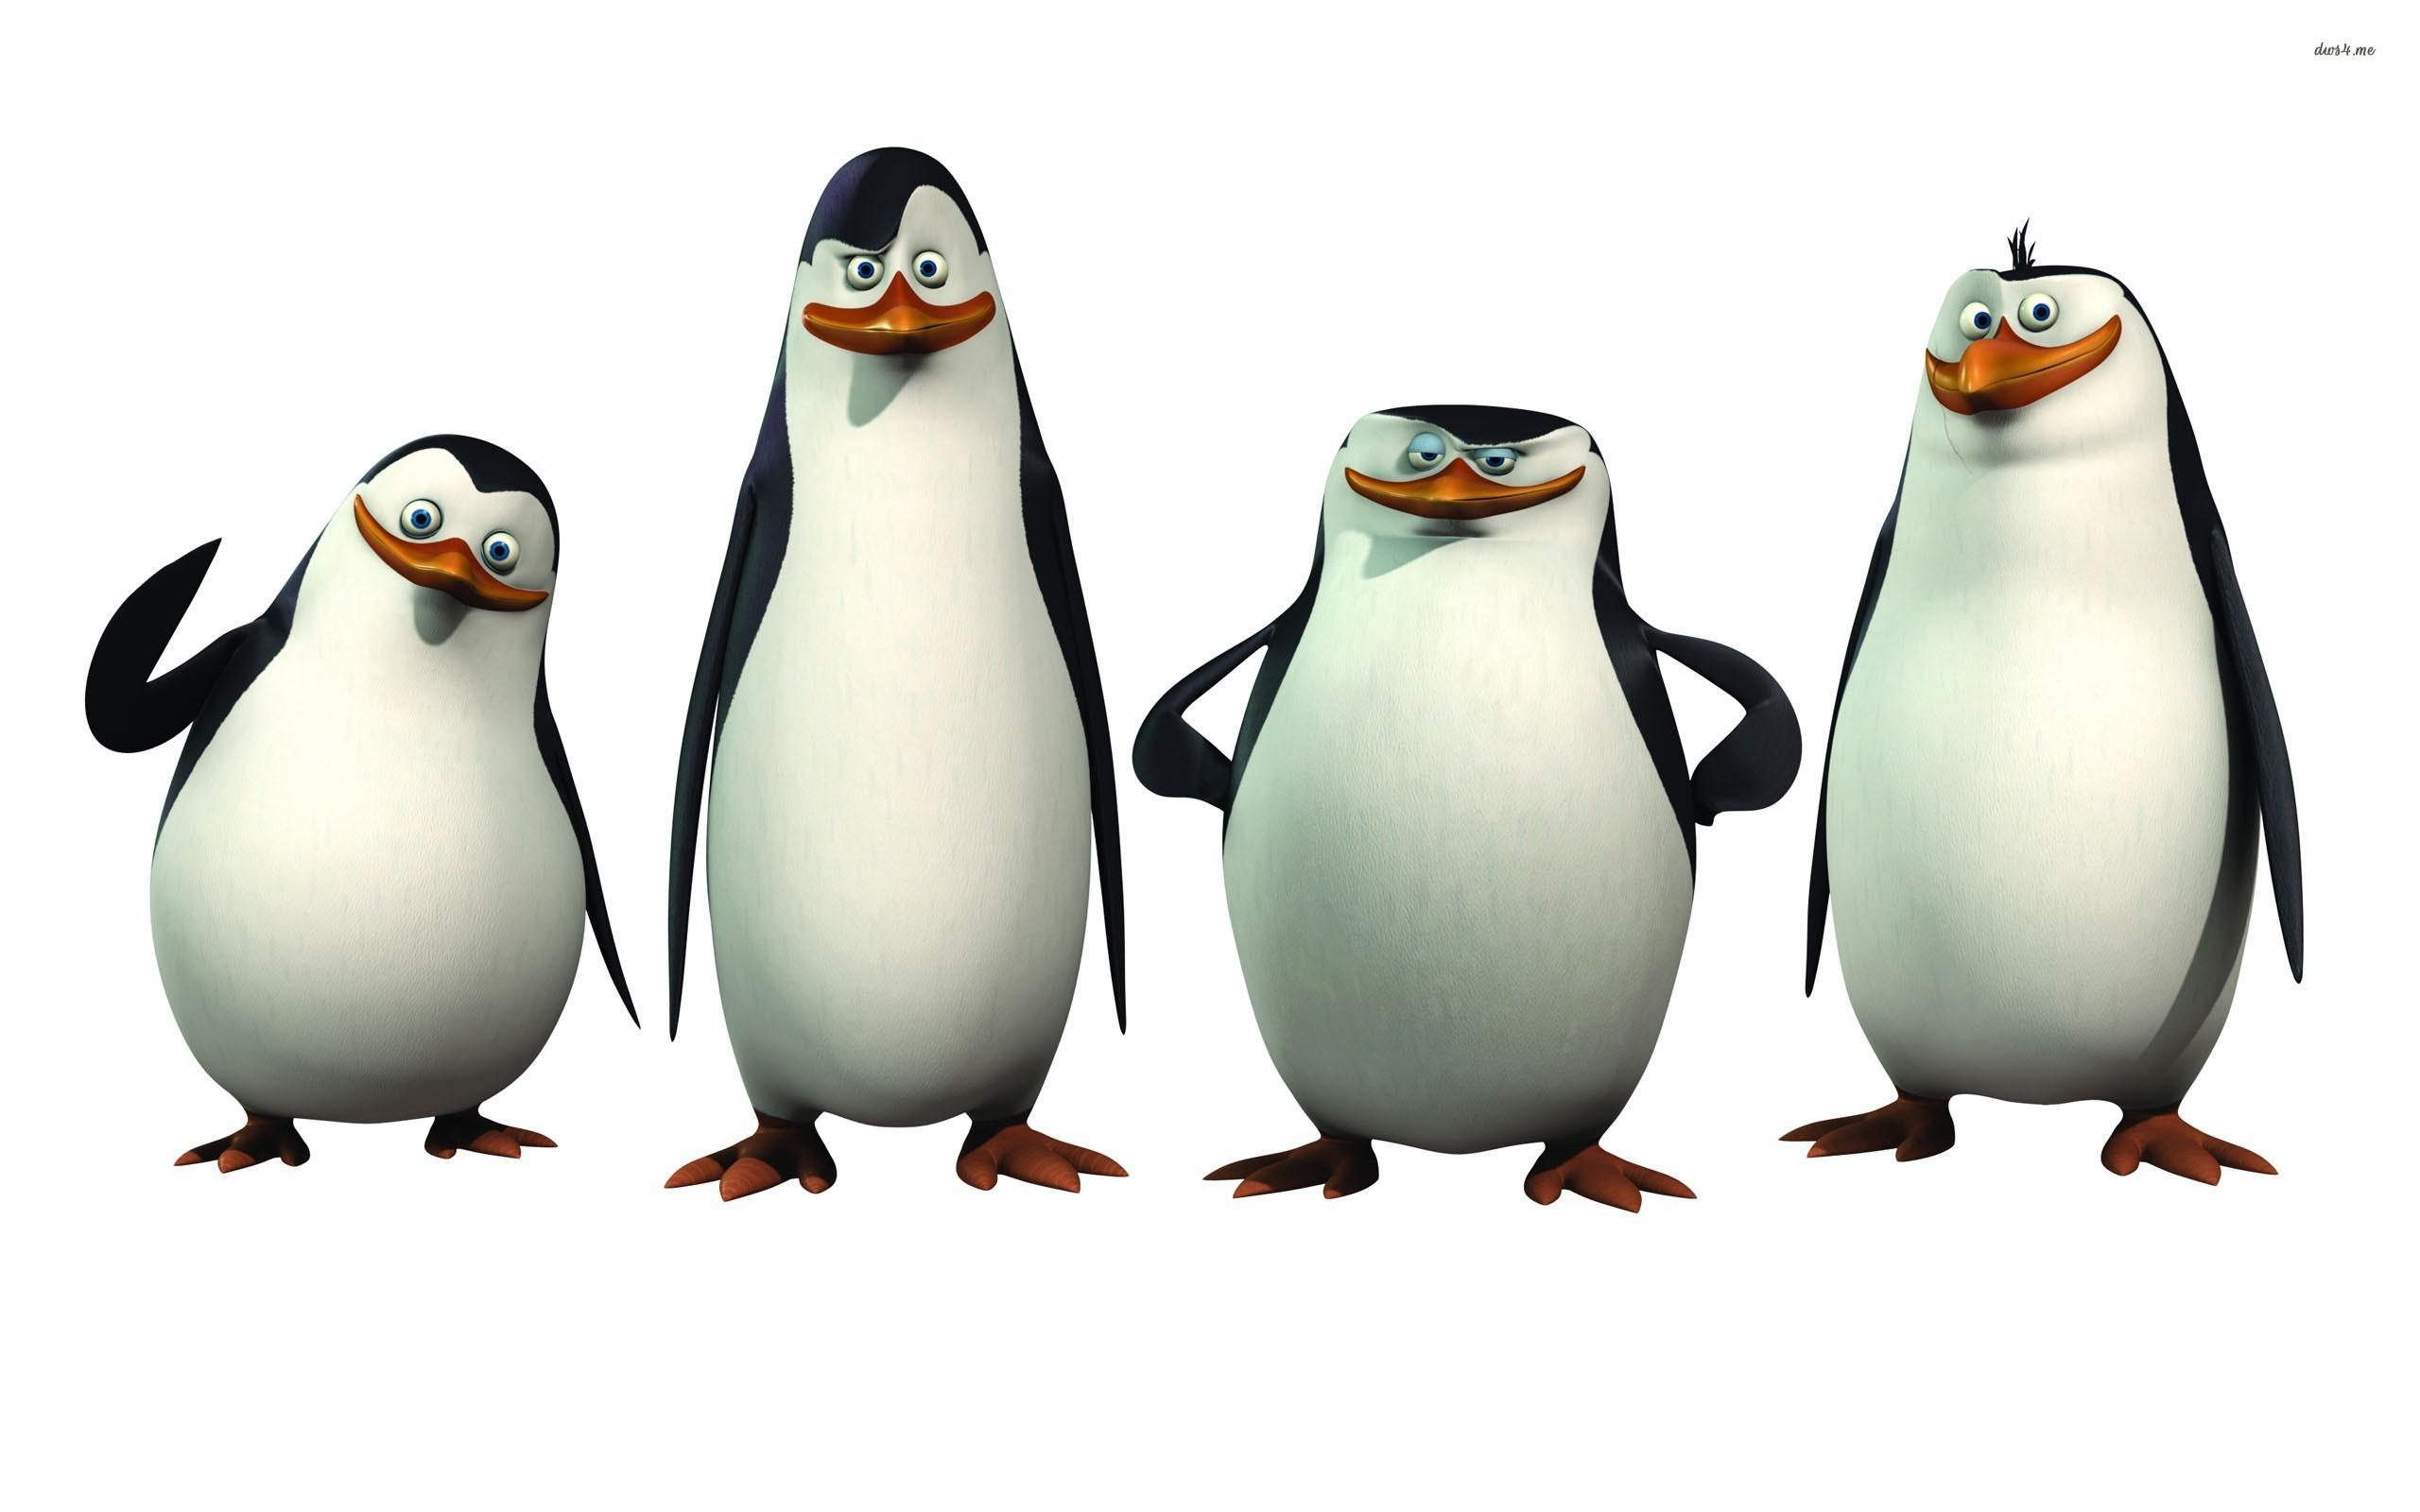 The Penguins of Madagascar wallpaper.